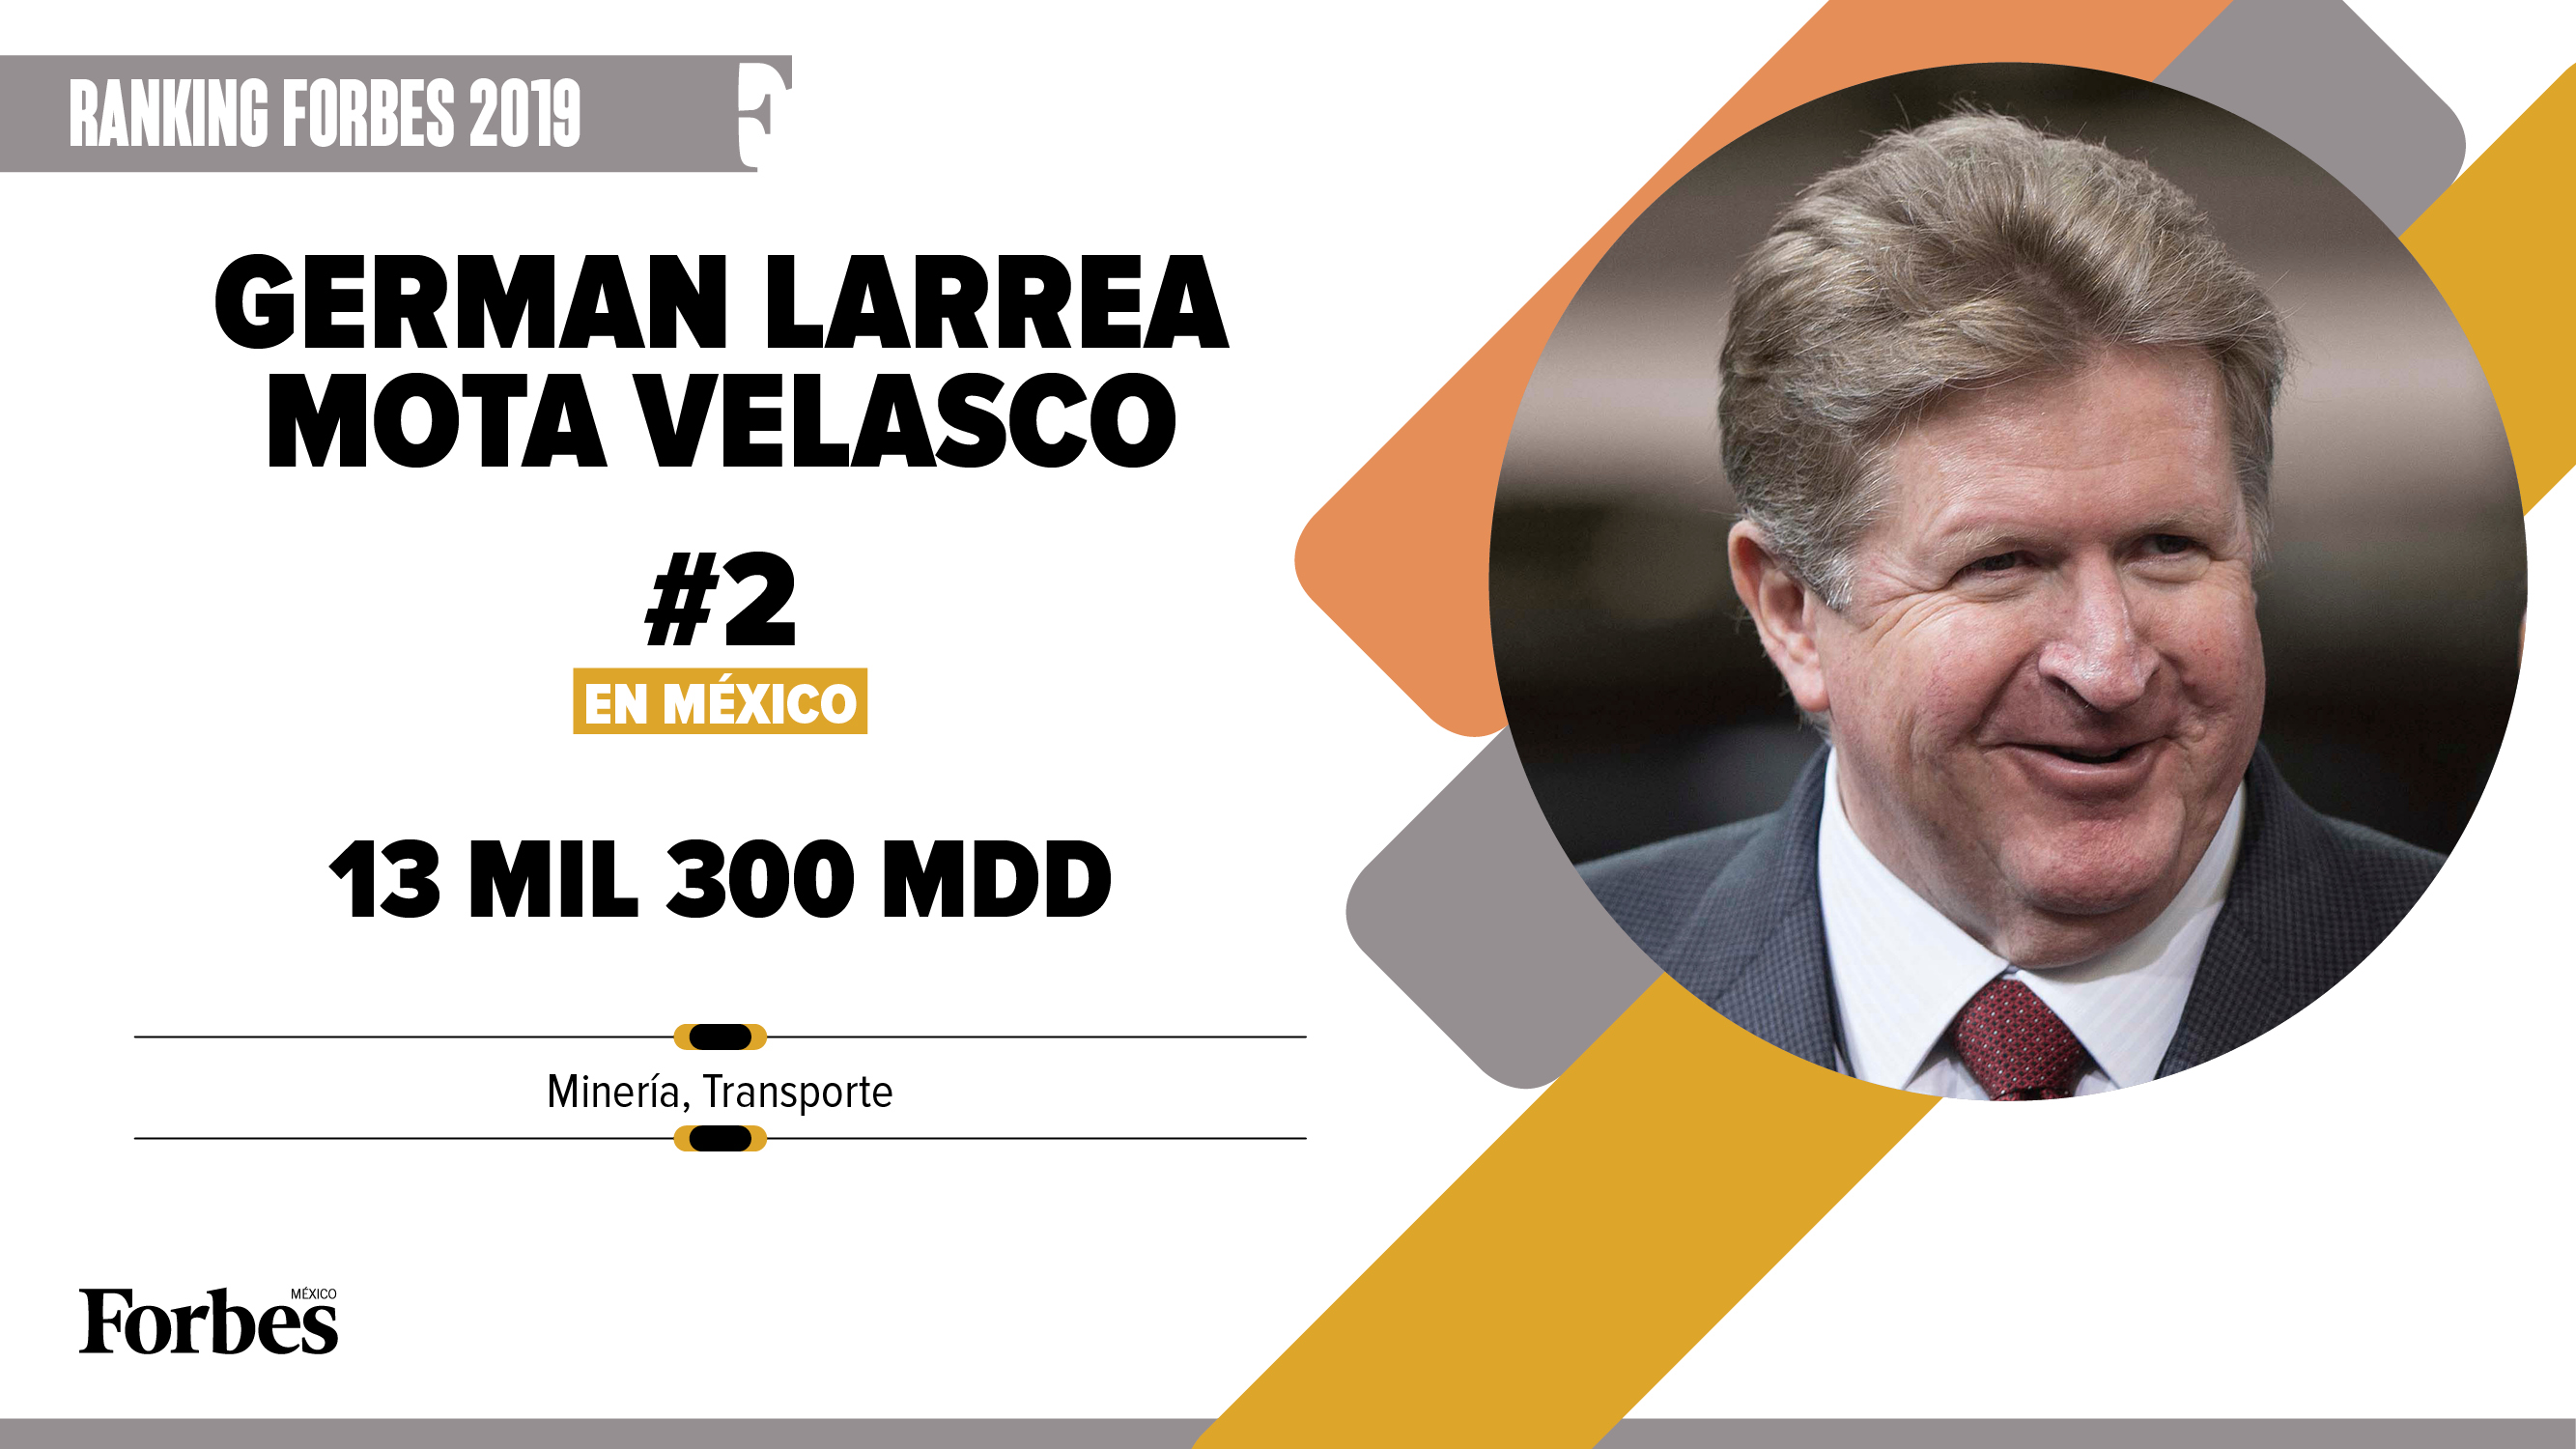 Billionaires 2019 | Germán Larrea, se mantiene a pesar de pérdidas